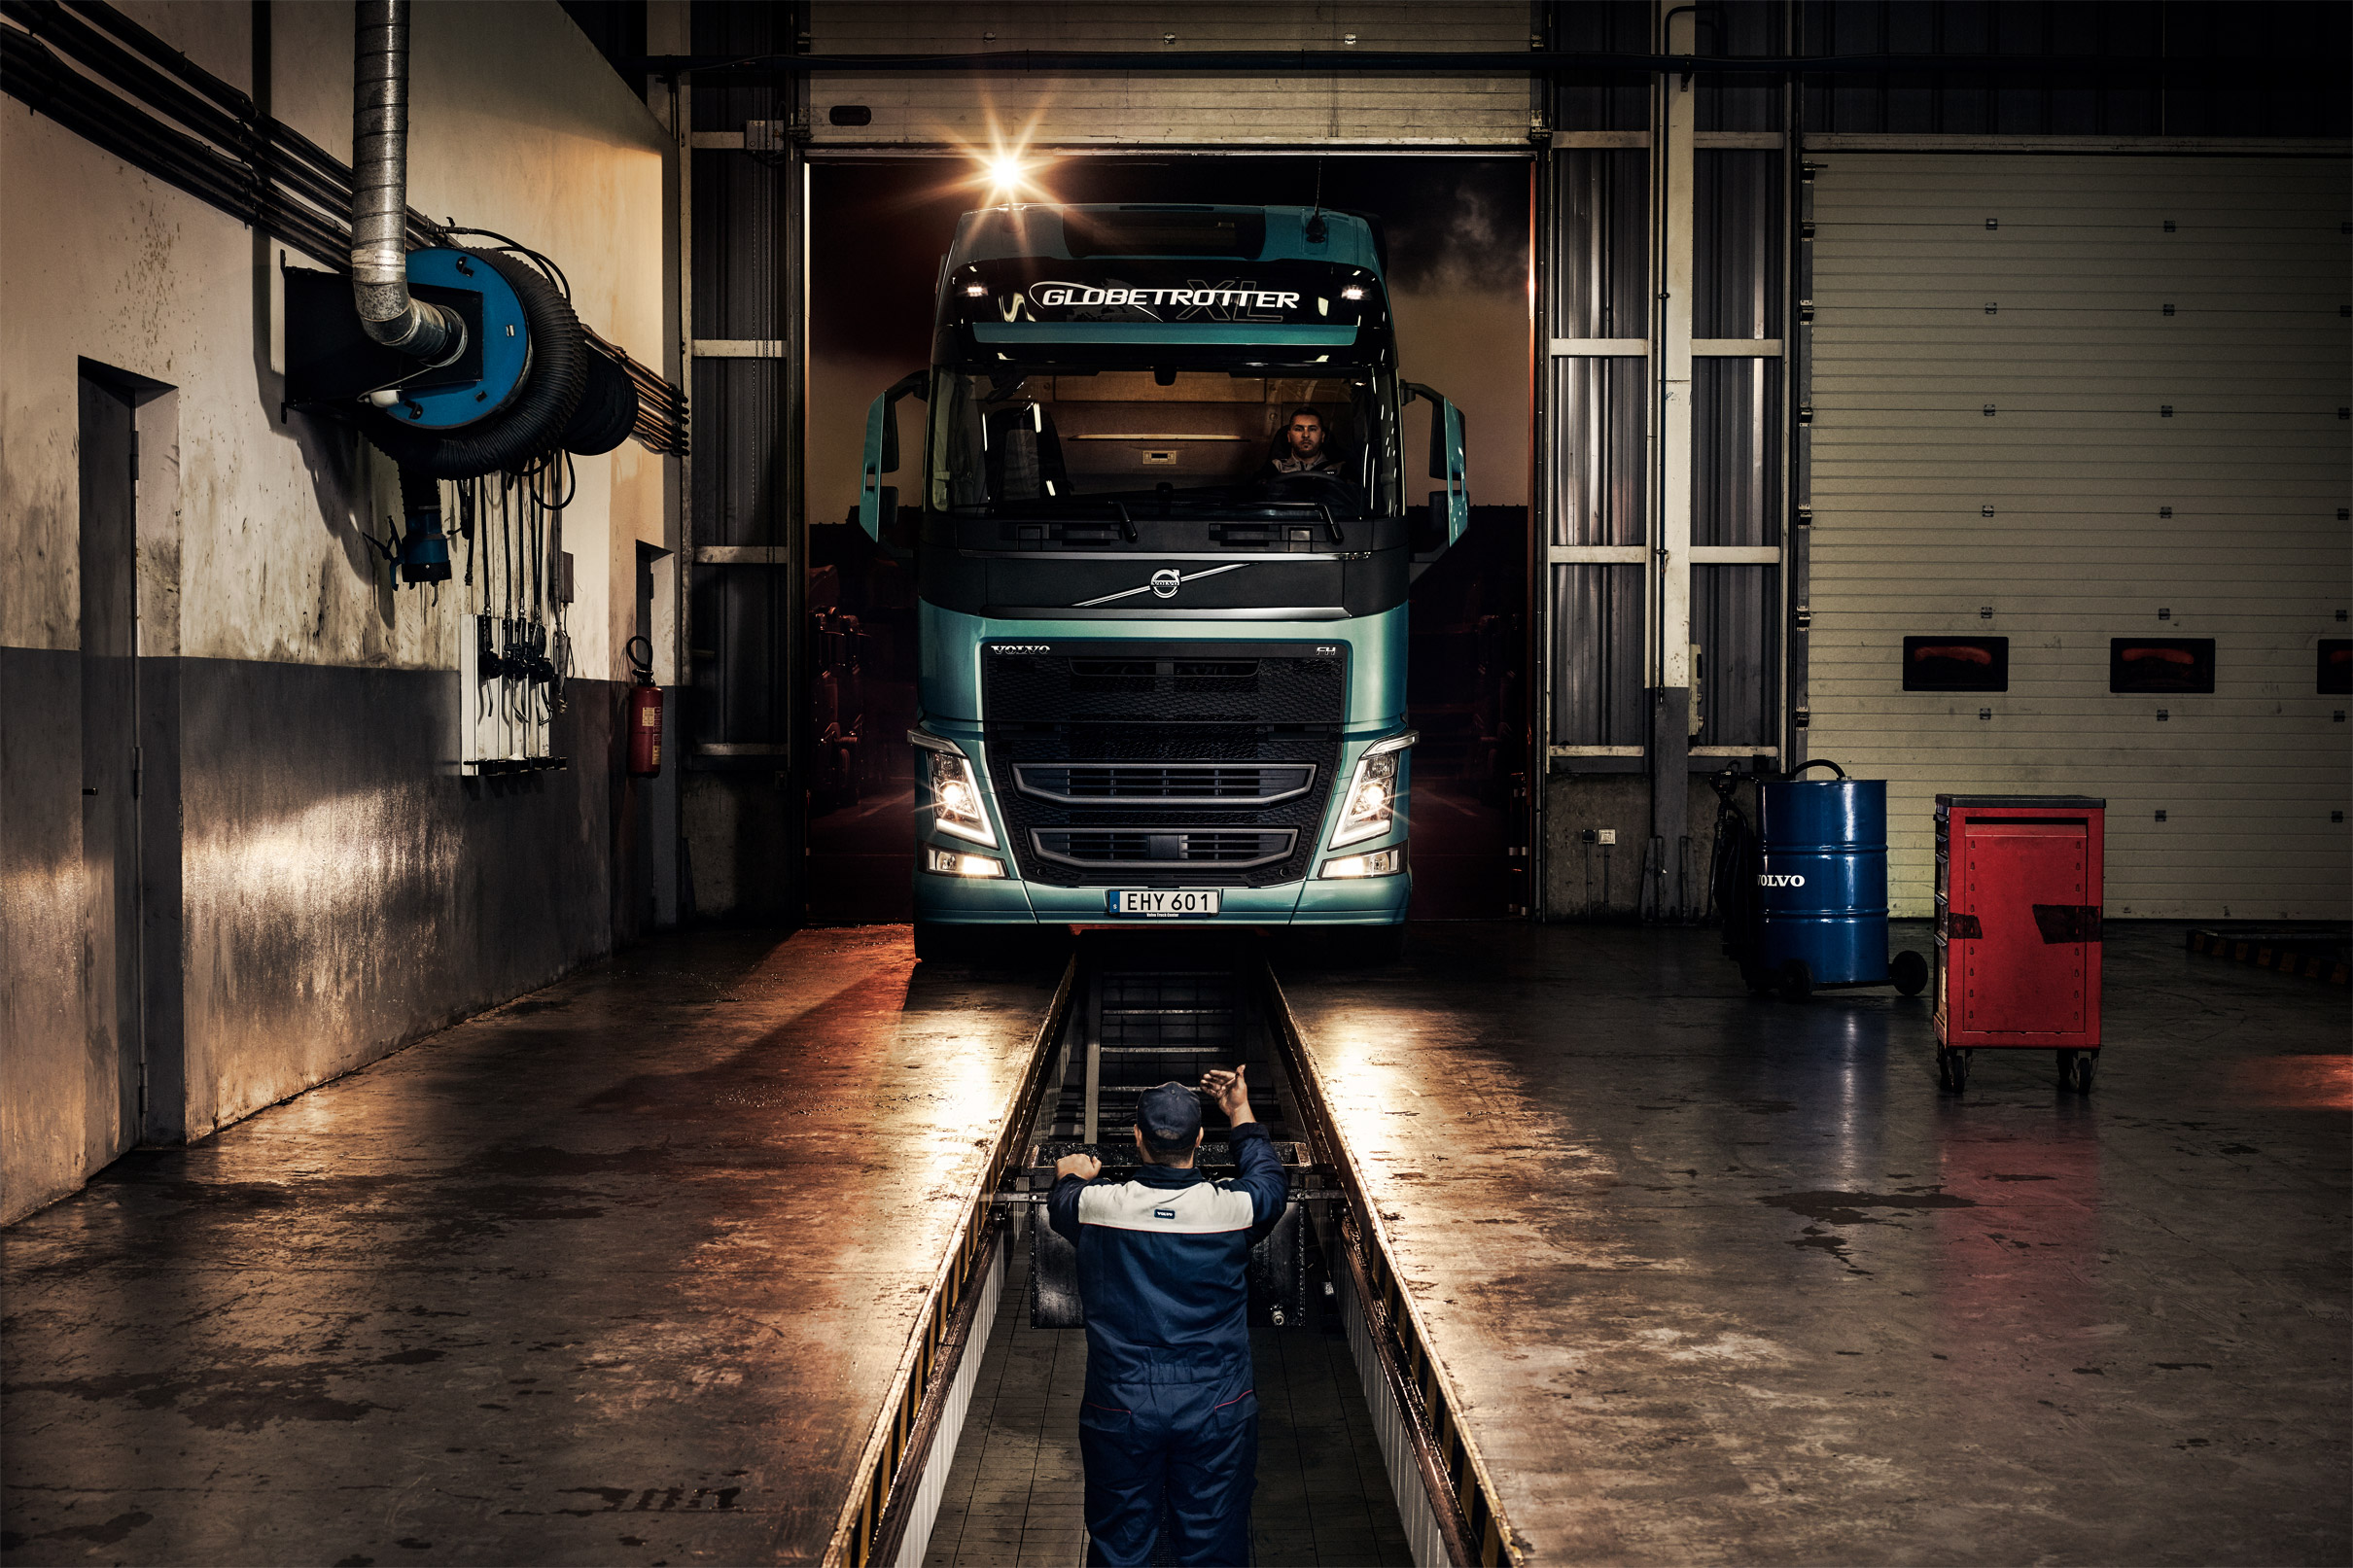 01-daniel_griffel-volvo_trucks-04.jpg